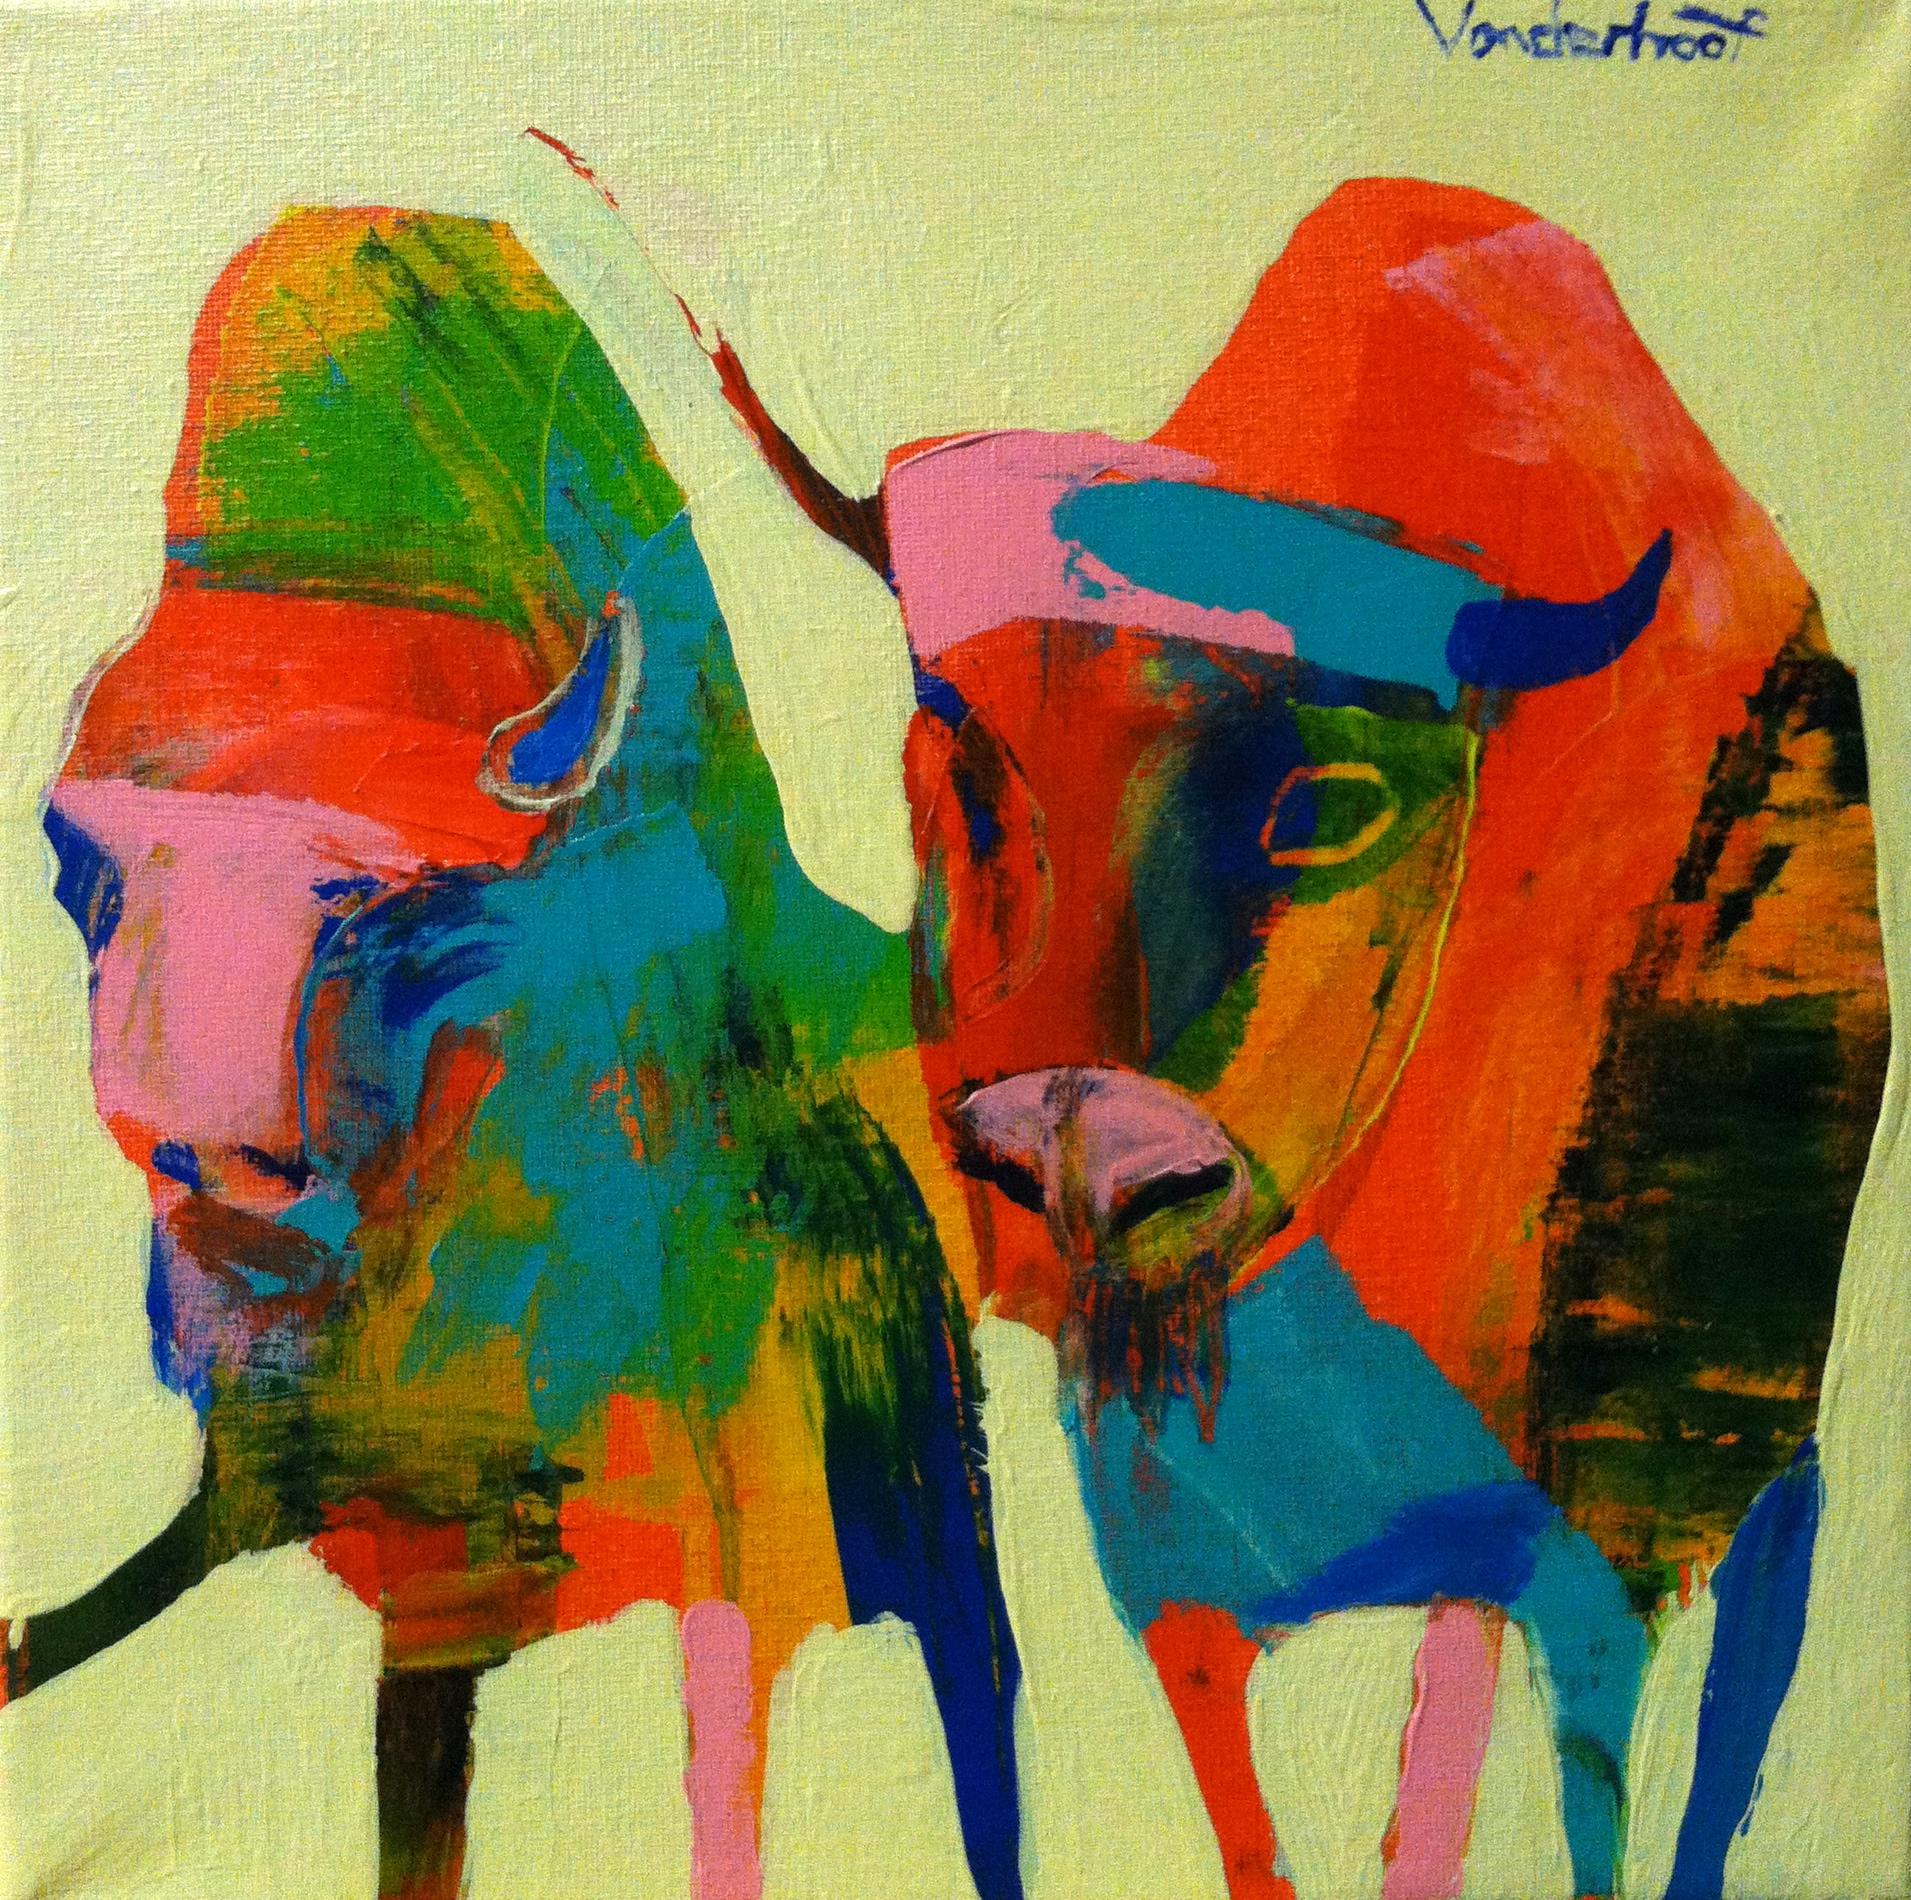 Buffalo, acrylic on canvas, 12x12 inches, 2015